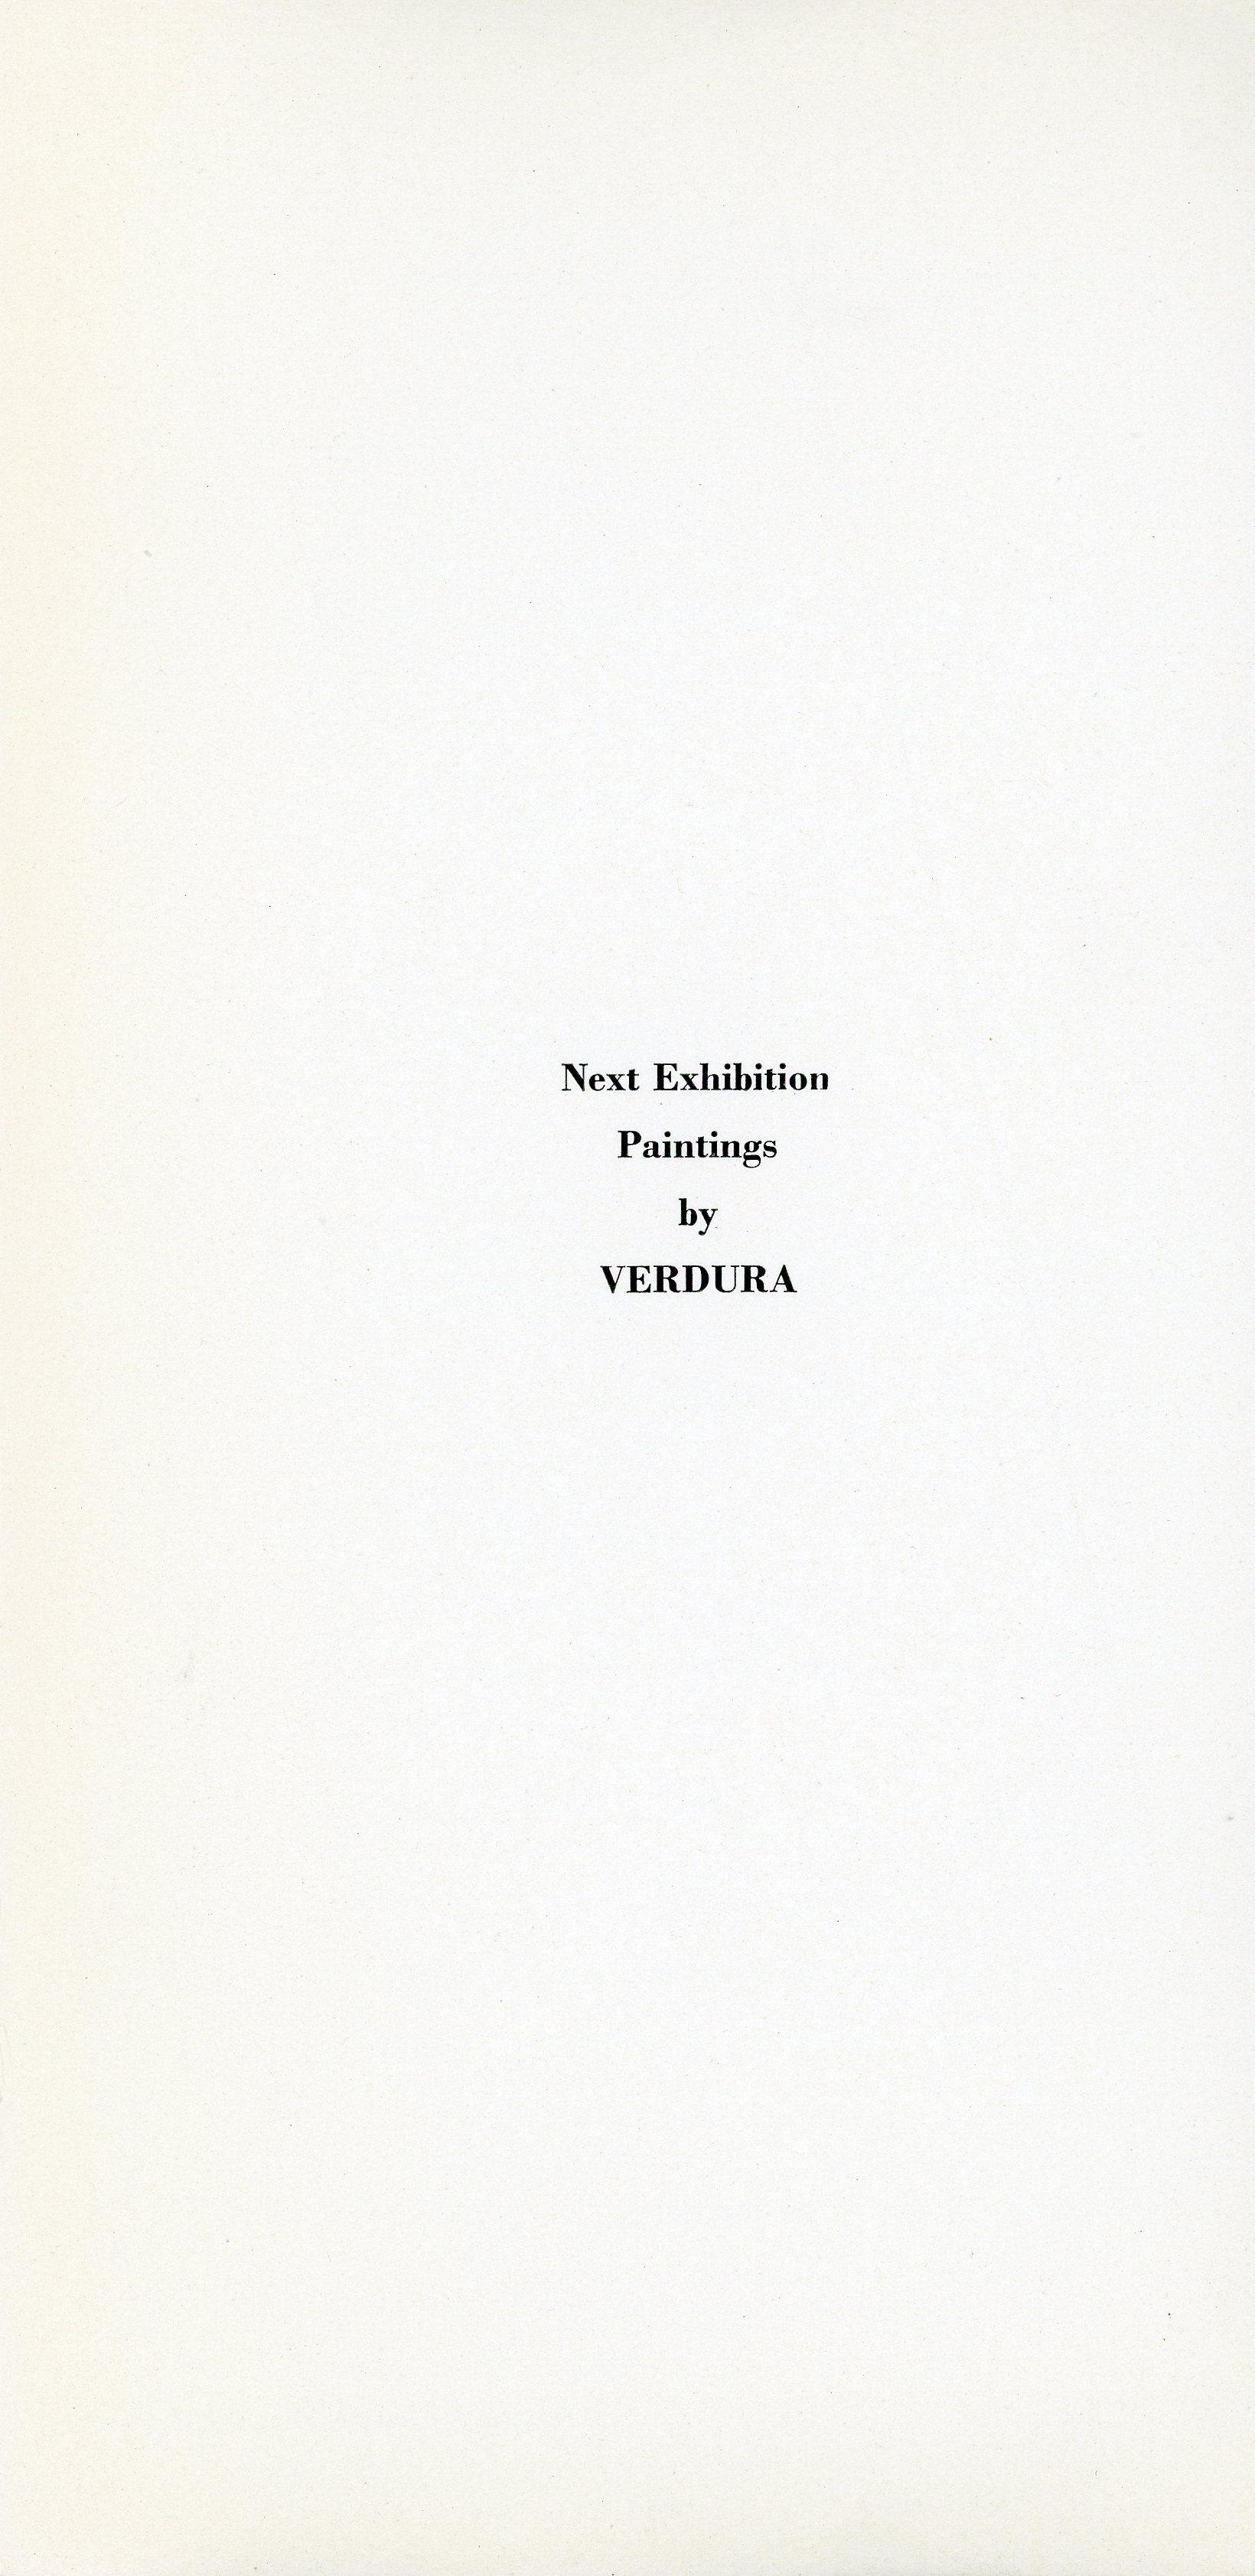 1958-09 Arthur Jeffress - Bruno Caruso_07.jpg